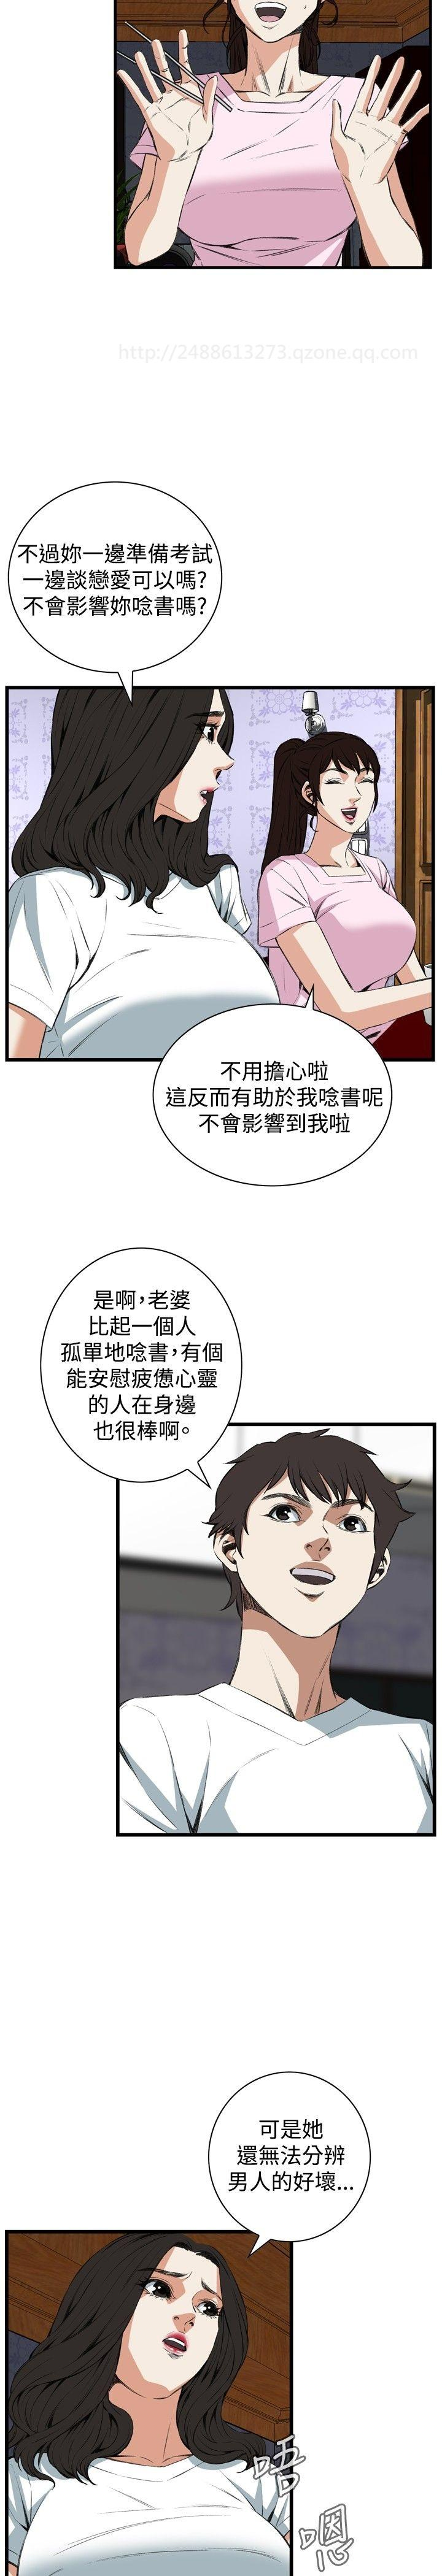 Take a Peek 偷窥 Ch.39~60 [Chinese]中文 520